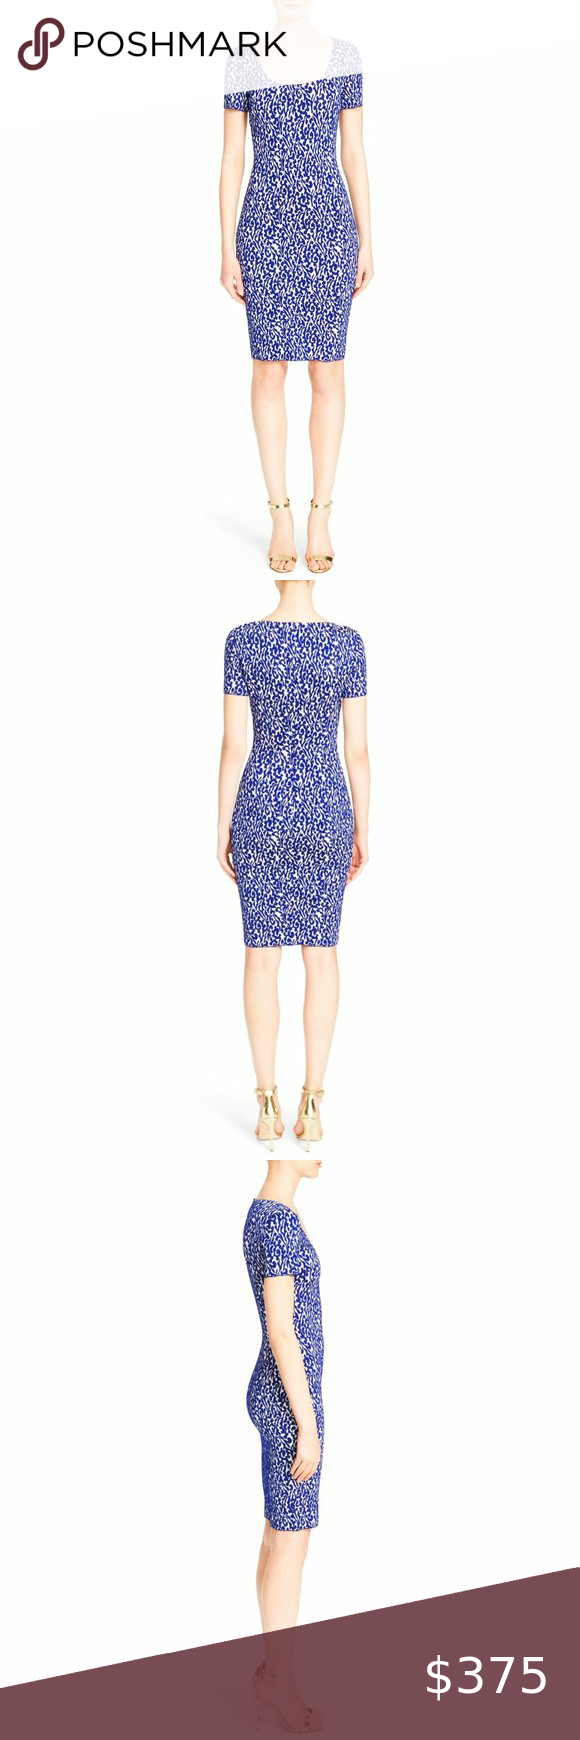 St John Blue White Jacquard Stretch Knit Dress 4 Stretch Knit Dress Knit Sheath Dress Midi Short Sleeve Dress [ 1740 x 580 Pixel ]